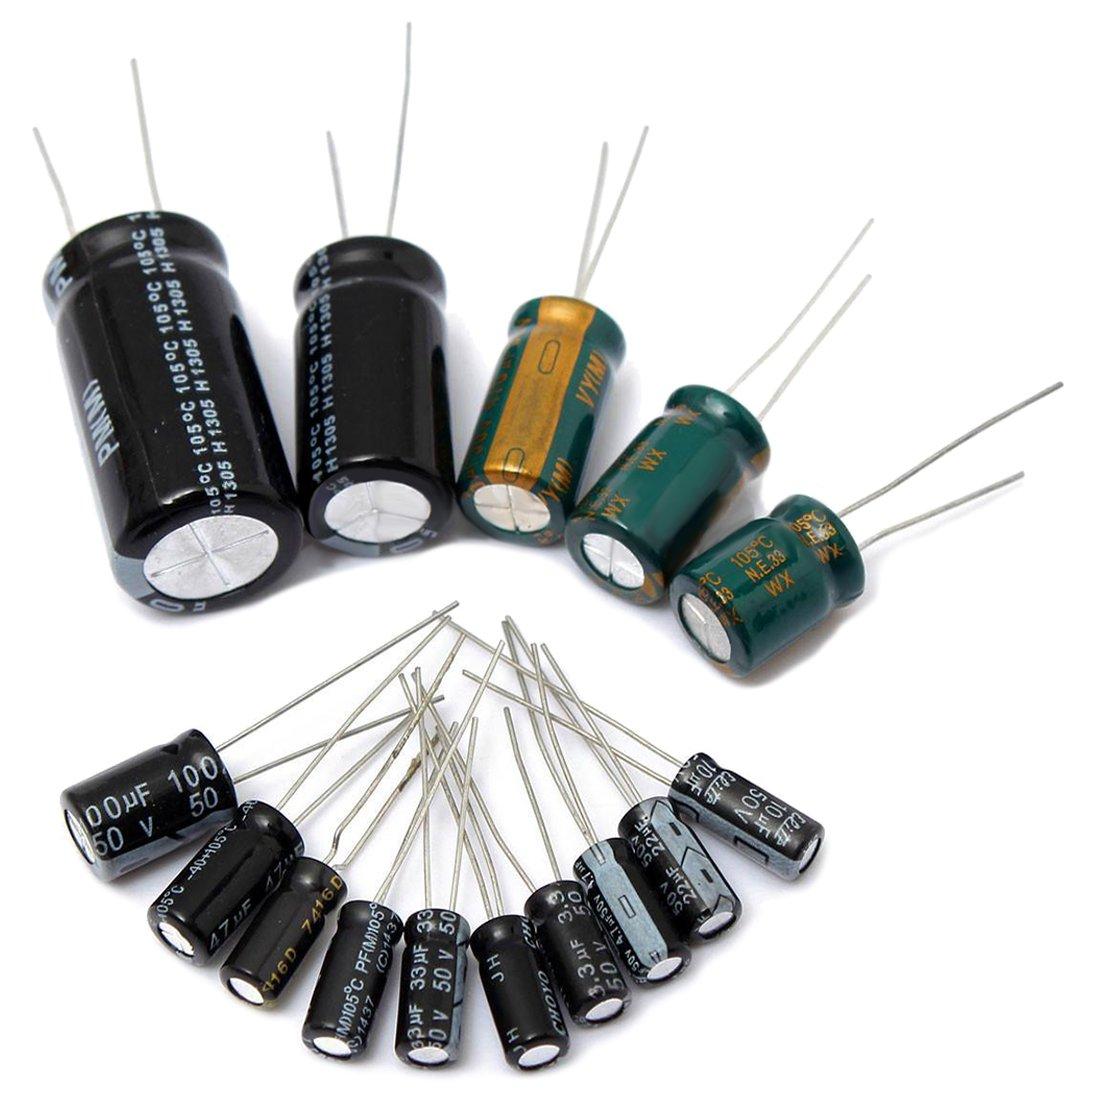 SODIAL(R) 120Pcs 15 value 50V 1uF-2200uF Electrolytic Capacitor Assortment Kit Set New